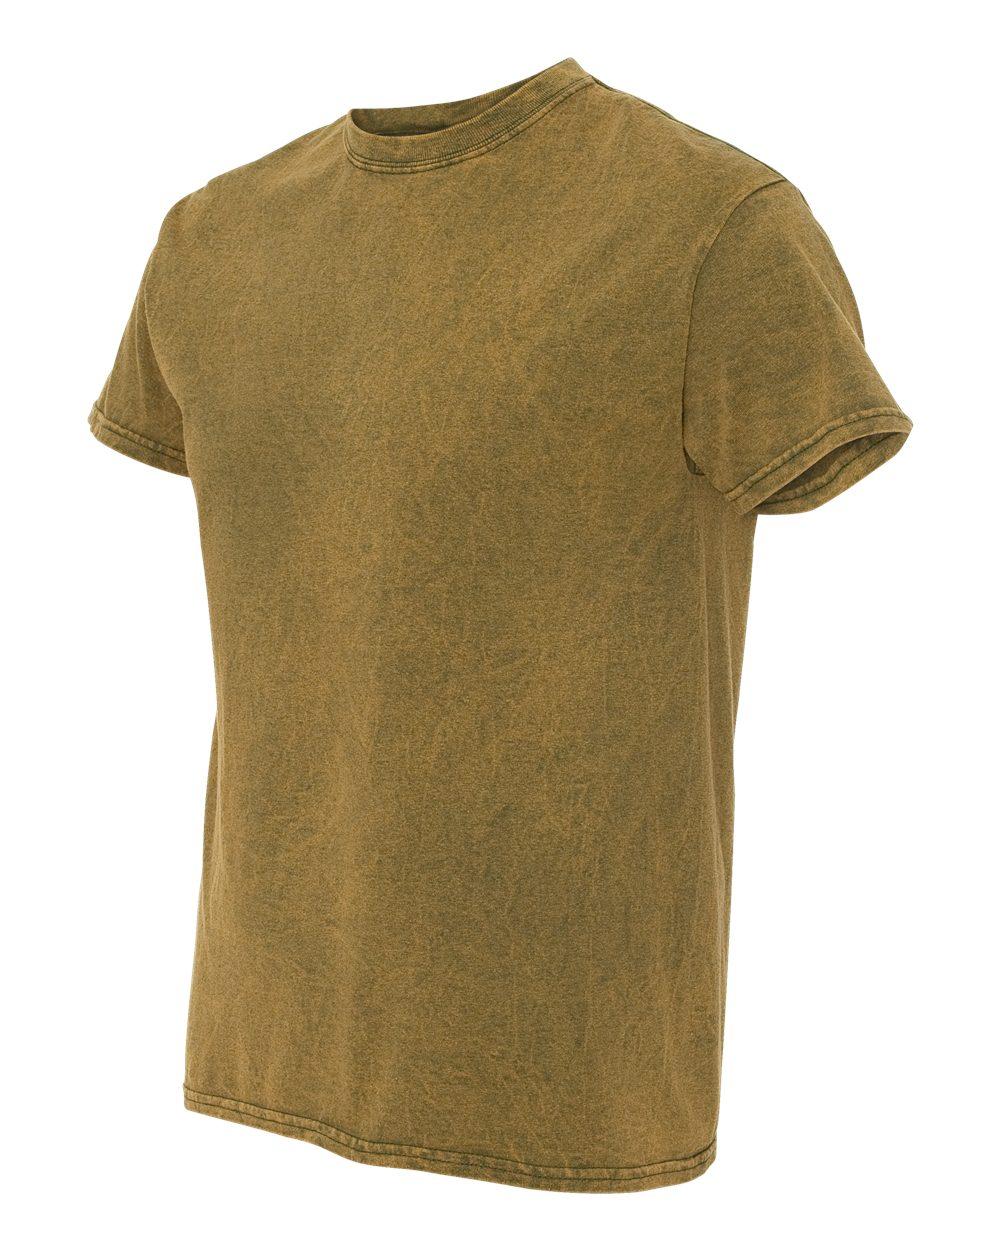 ddee5ff50217 Tie-Dyed 200VW - Volcano Wash T-Shirt  5.98 - Men s T-Shirts